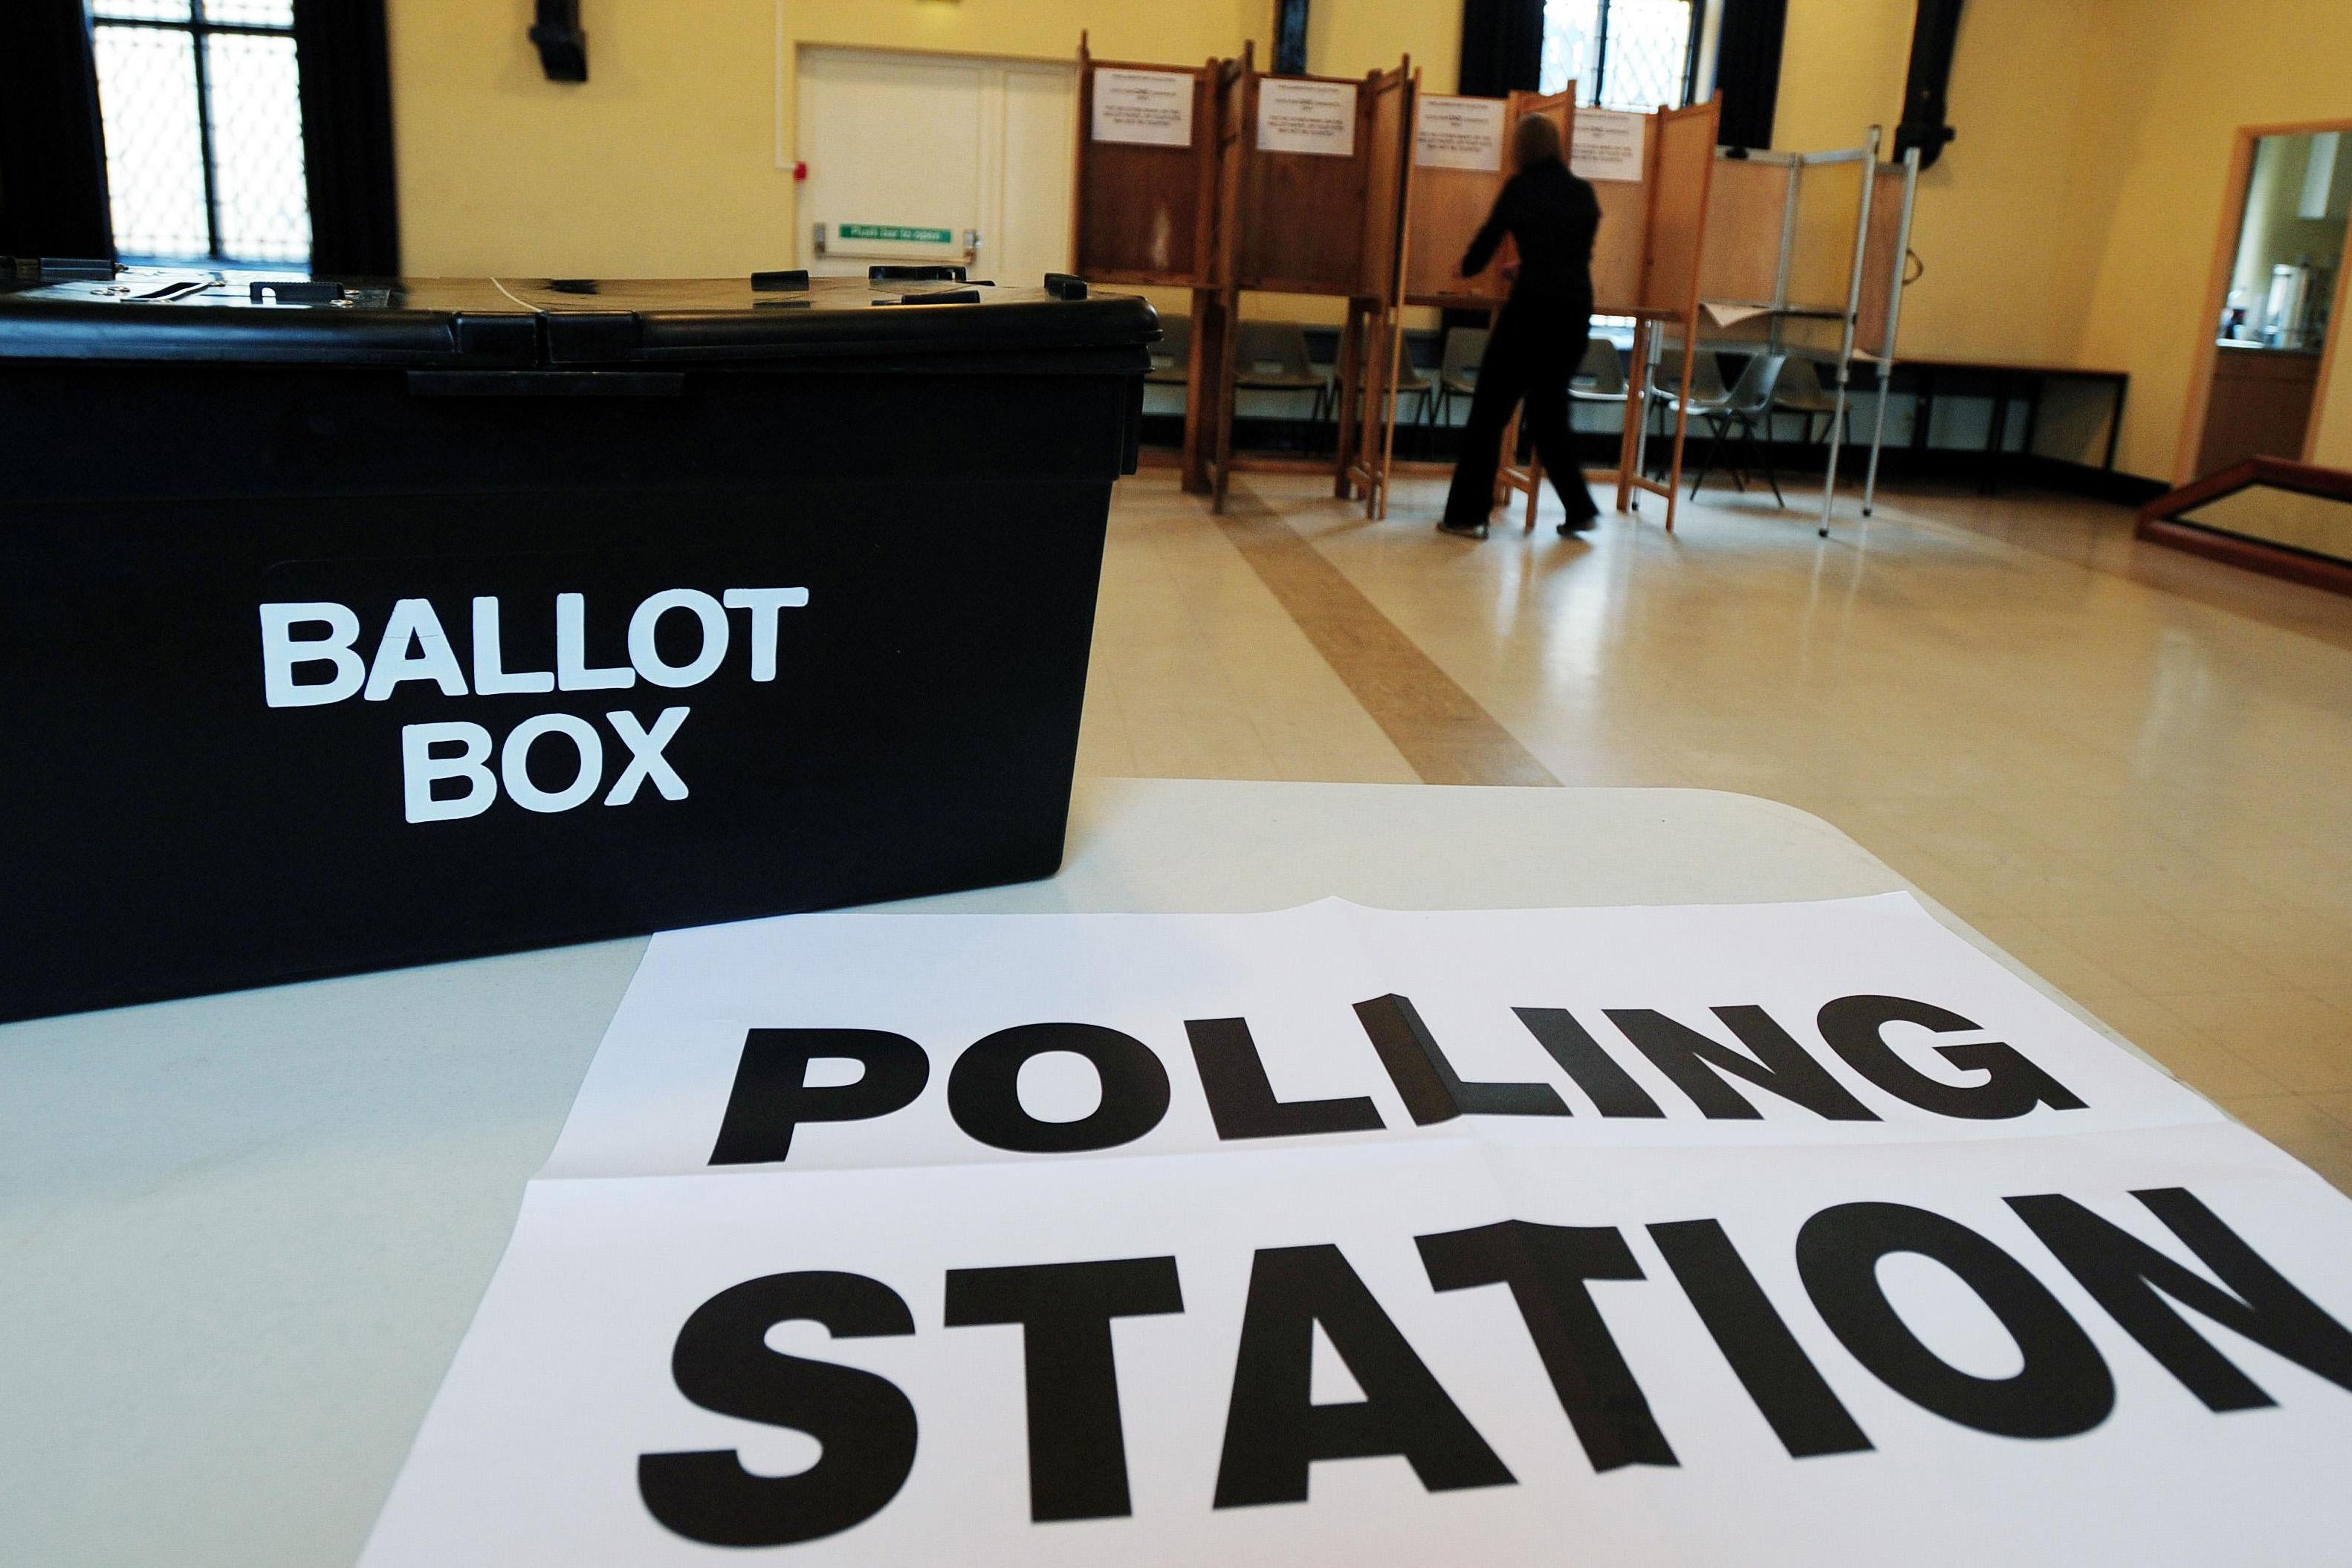 Ballot box 'is key to democracy'